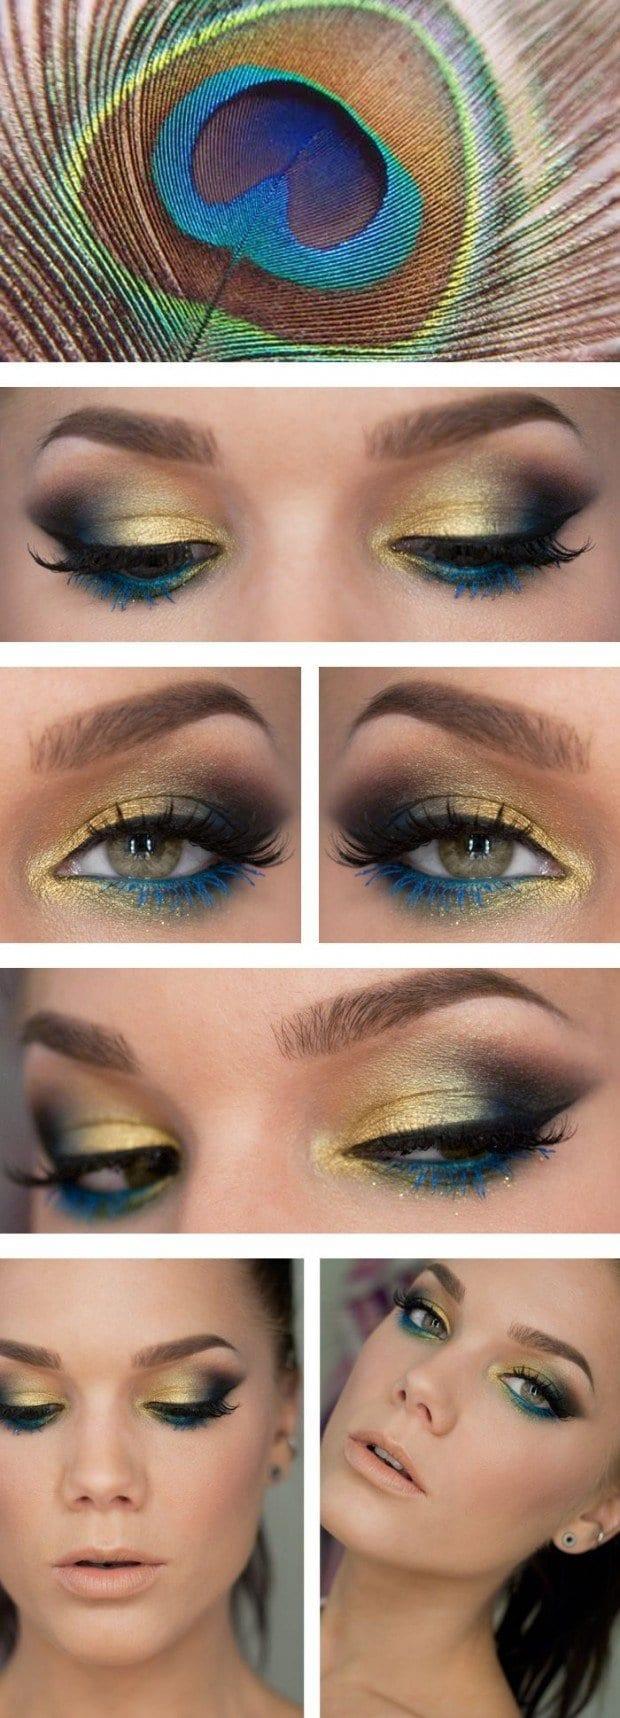 Colourfull Eye makeup Tutorials